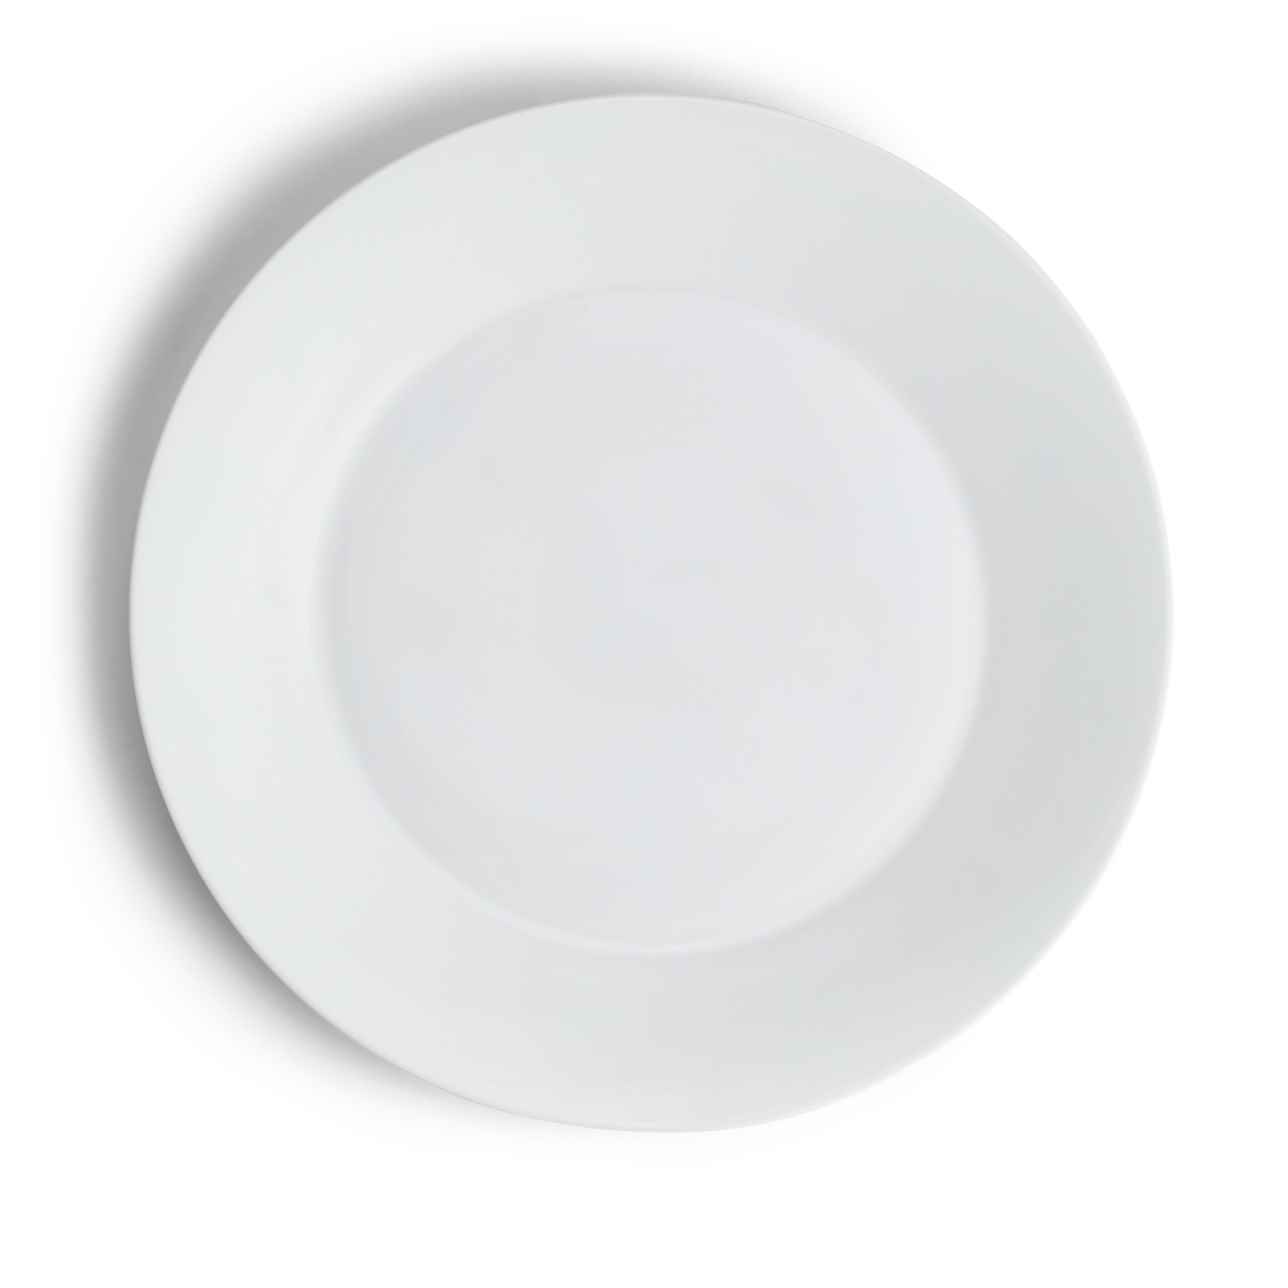 Jasper Conran White Dinner Plate 27cm